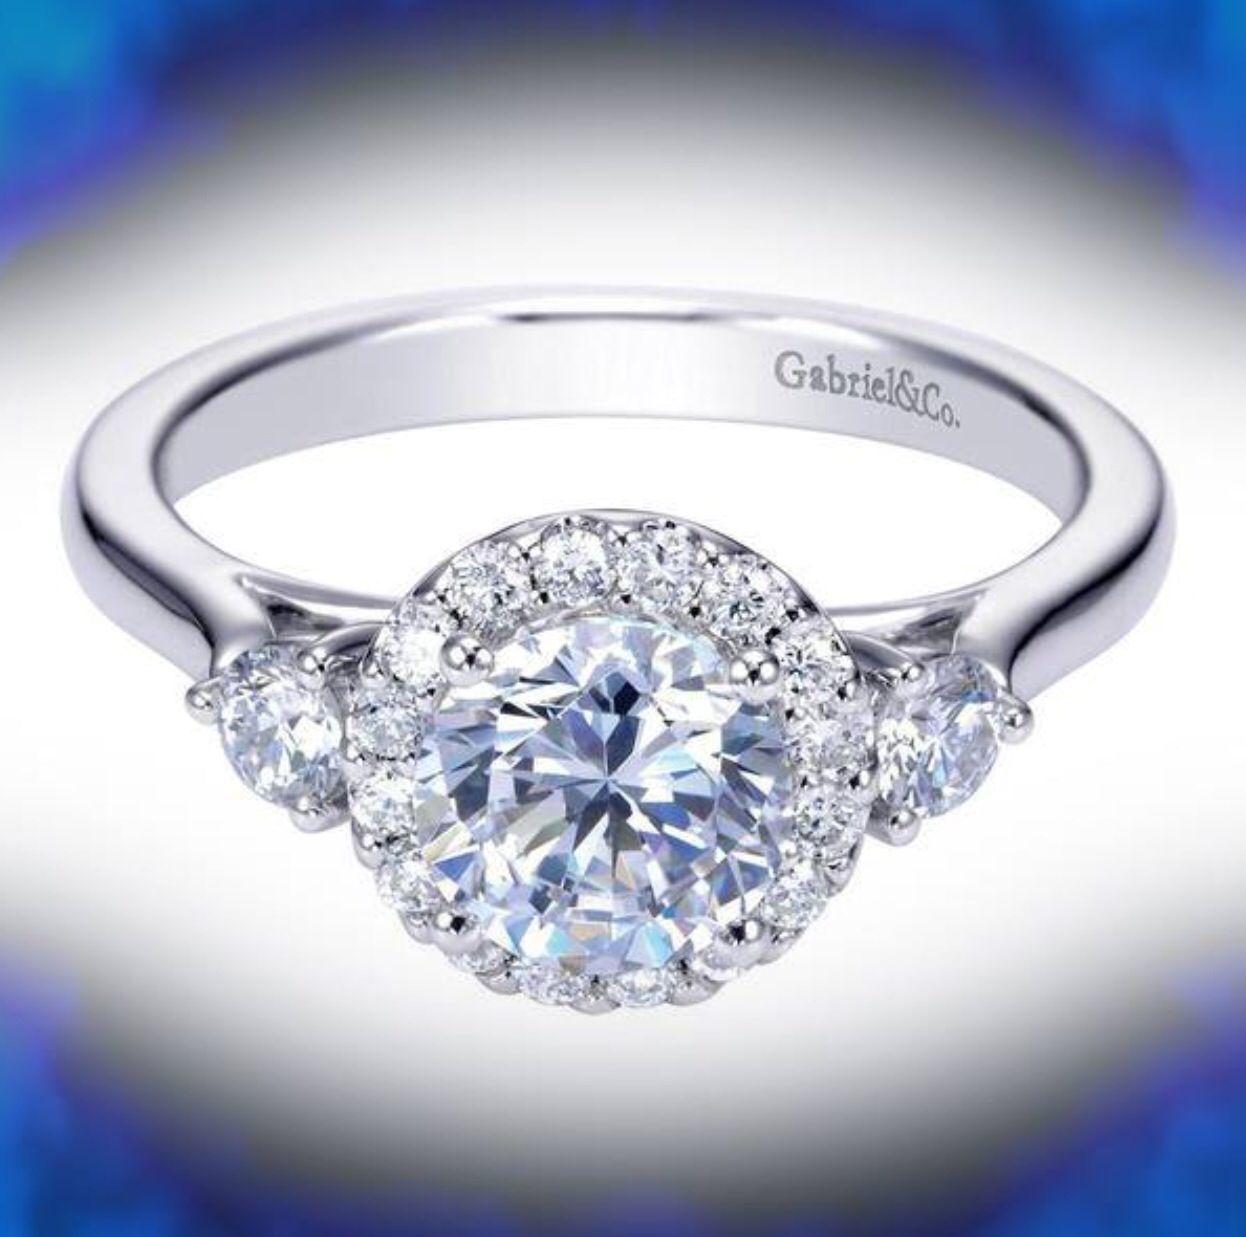 Simply Spectacular...  White gold halo diamond ring #ring#whitegold#diamond#engagementring##haloring#platinum#gabrielny#ajkleinjewelers.  203-292-3300